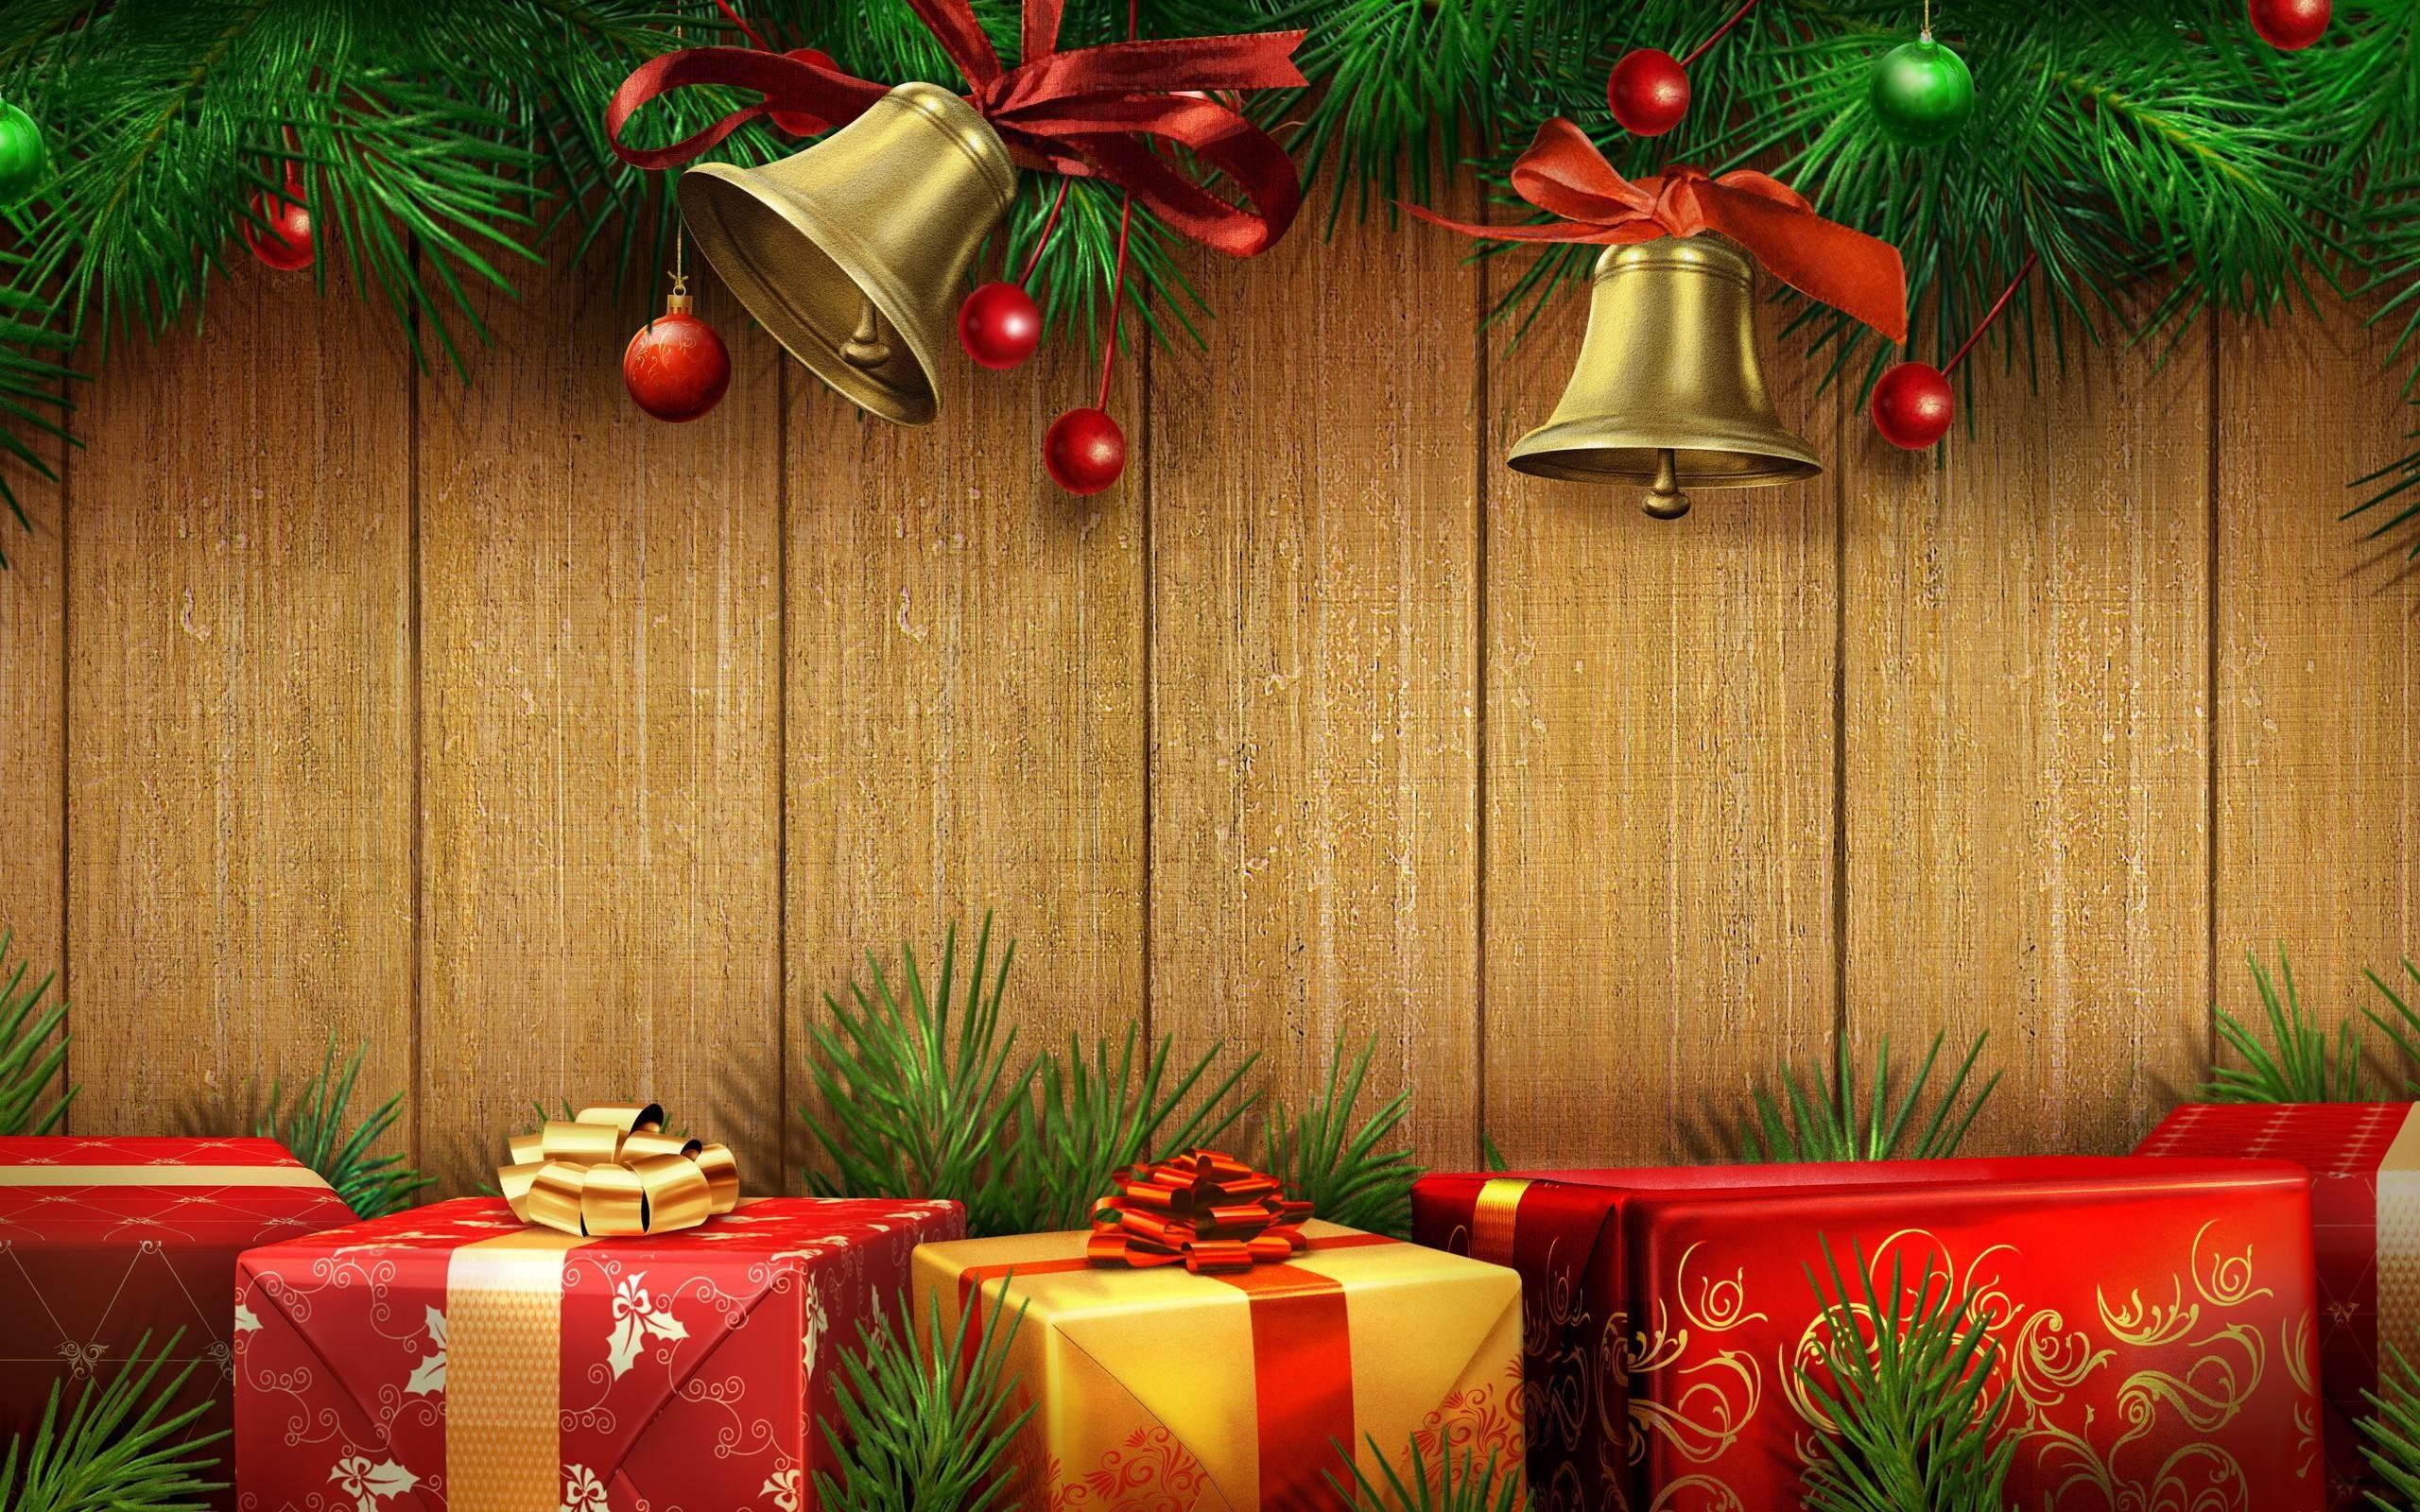 2560x1600 xmas stuff for christmas gifts wallpaper